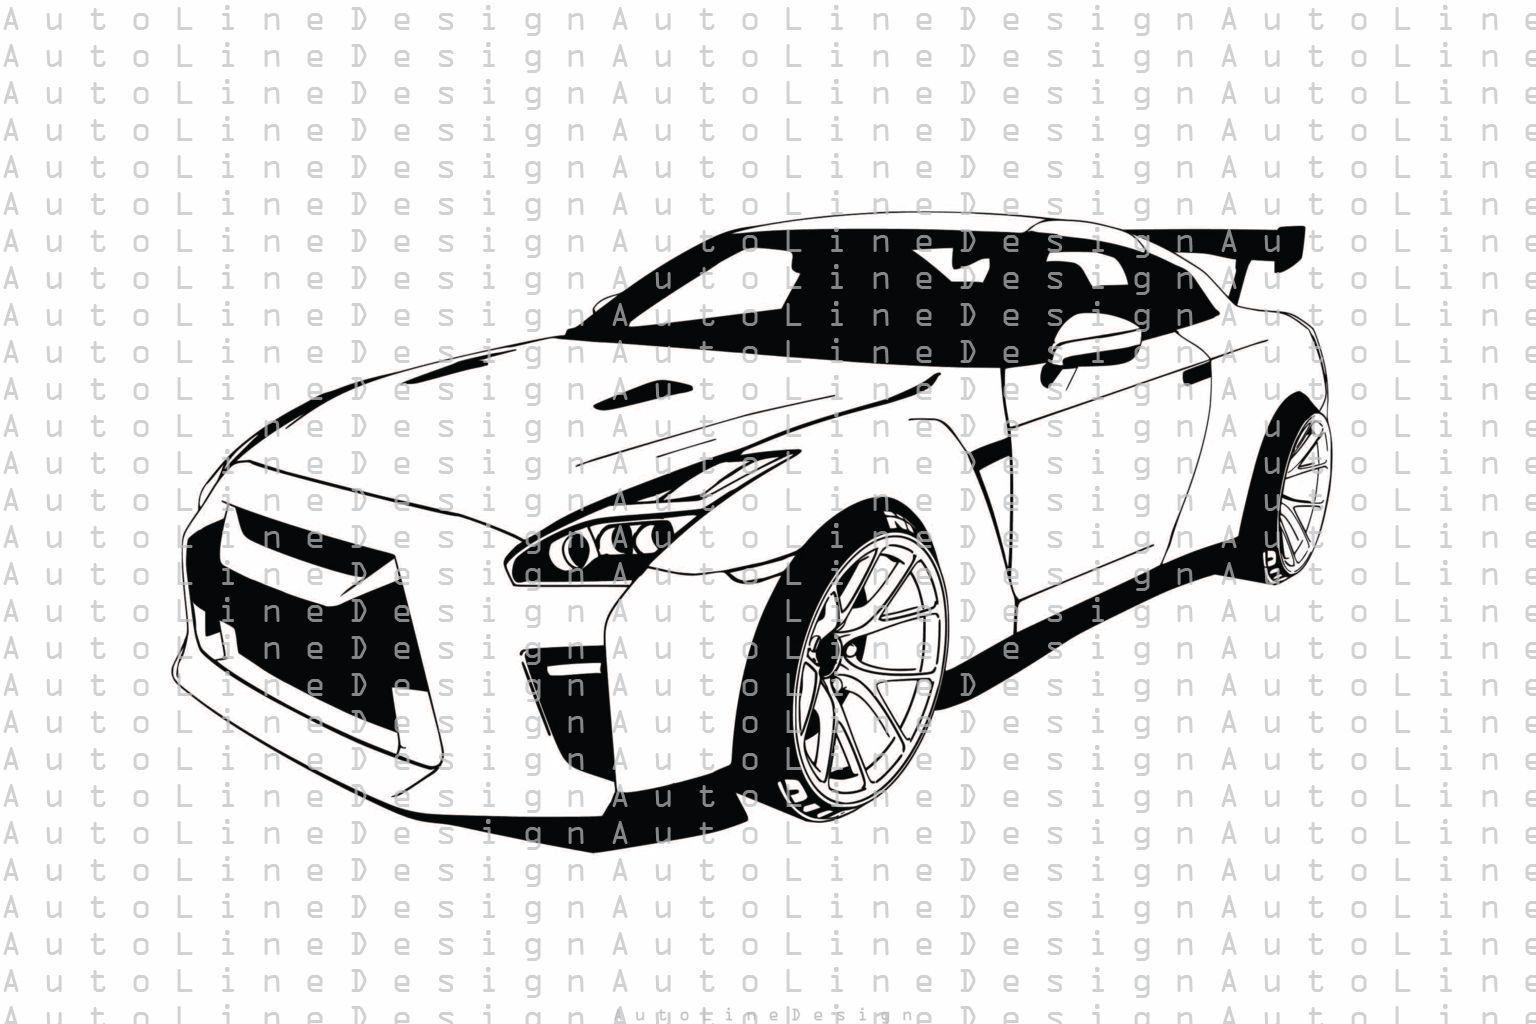 Nissan Gtr R35 Nismo Svg Pdf Dxf Eps Png Illustration Vector Etsy Nissan Gtr R35 Gtr R35 Nissan Gtr [ 1024 x 1536 Pixel ]